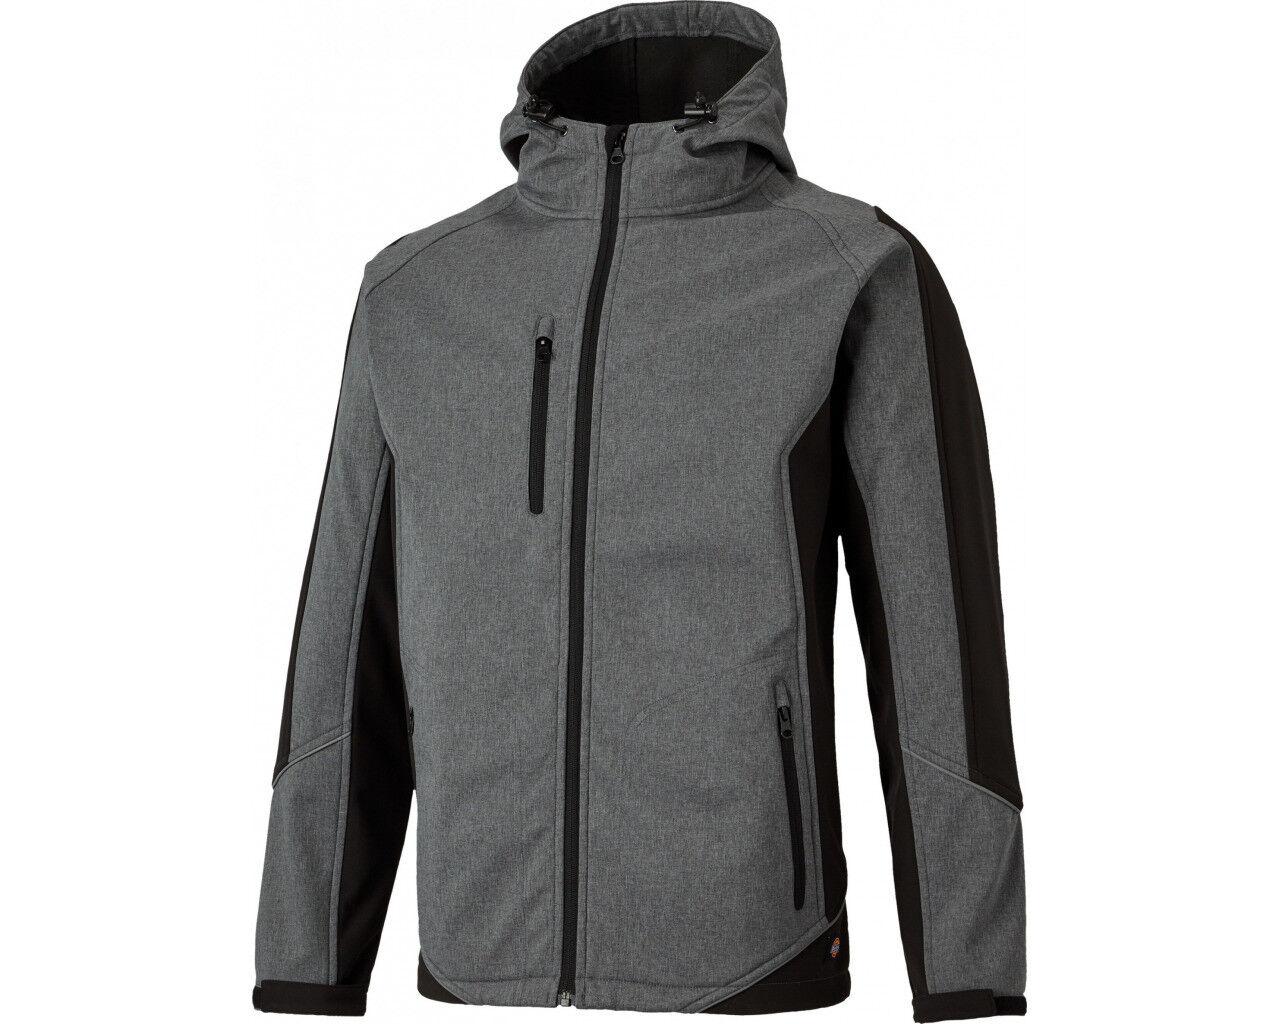 Dickies Lewiston Jacket Mens Premium Quality Contrast Coat JW7014